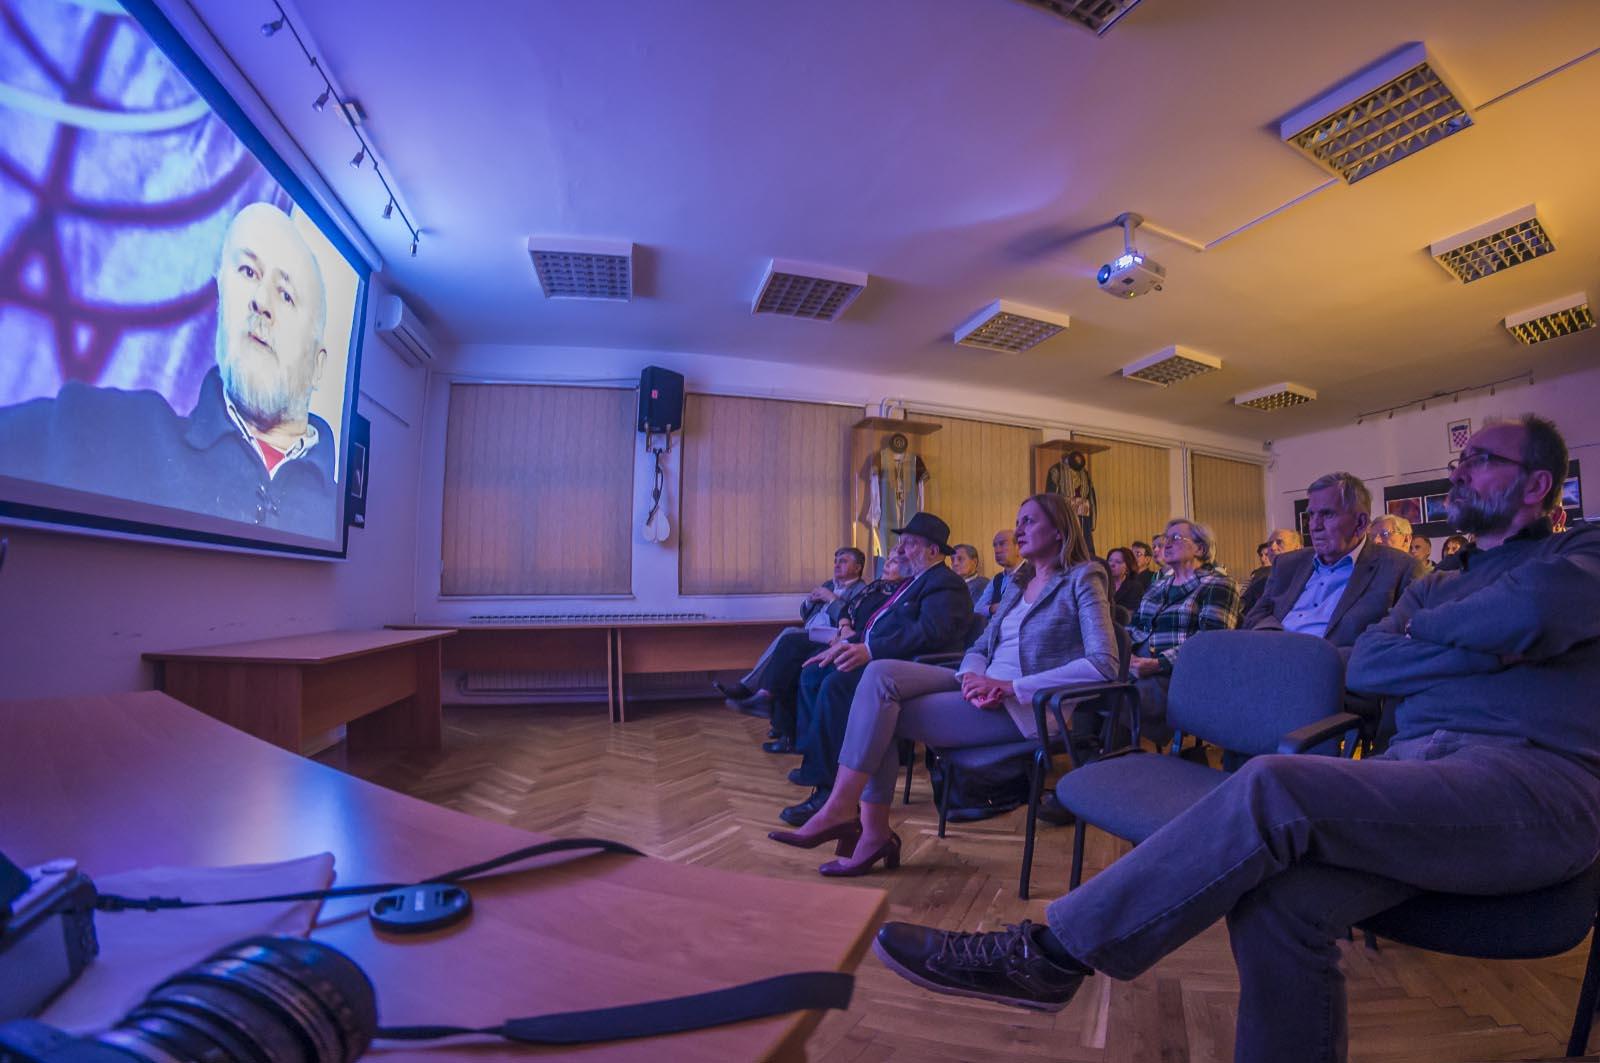 Projekcija Filma U Klubu Crnogoraca (14)